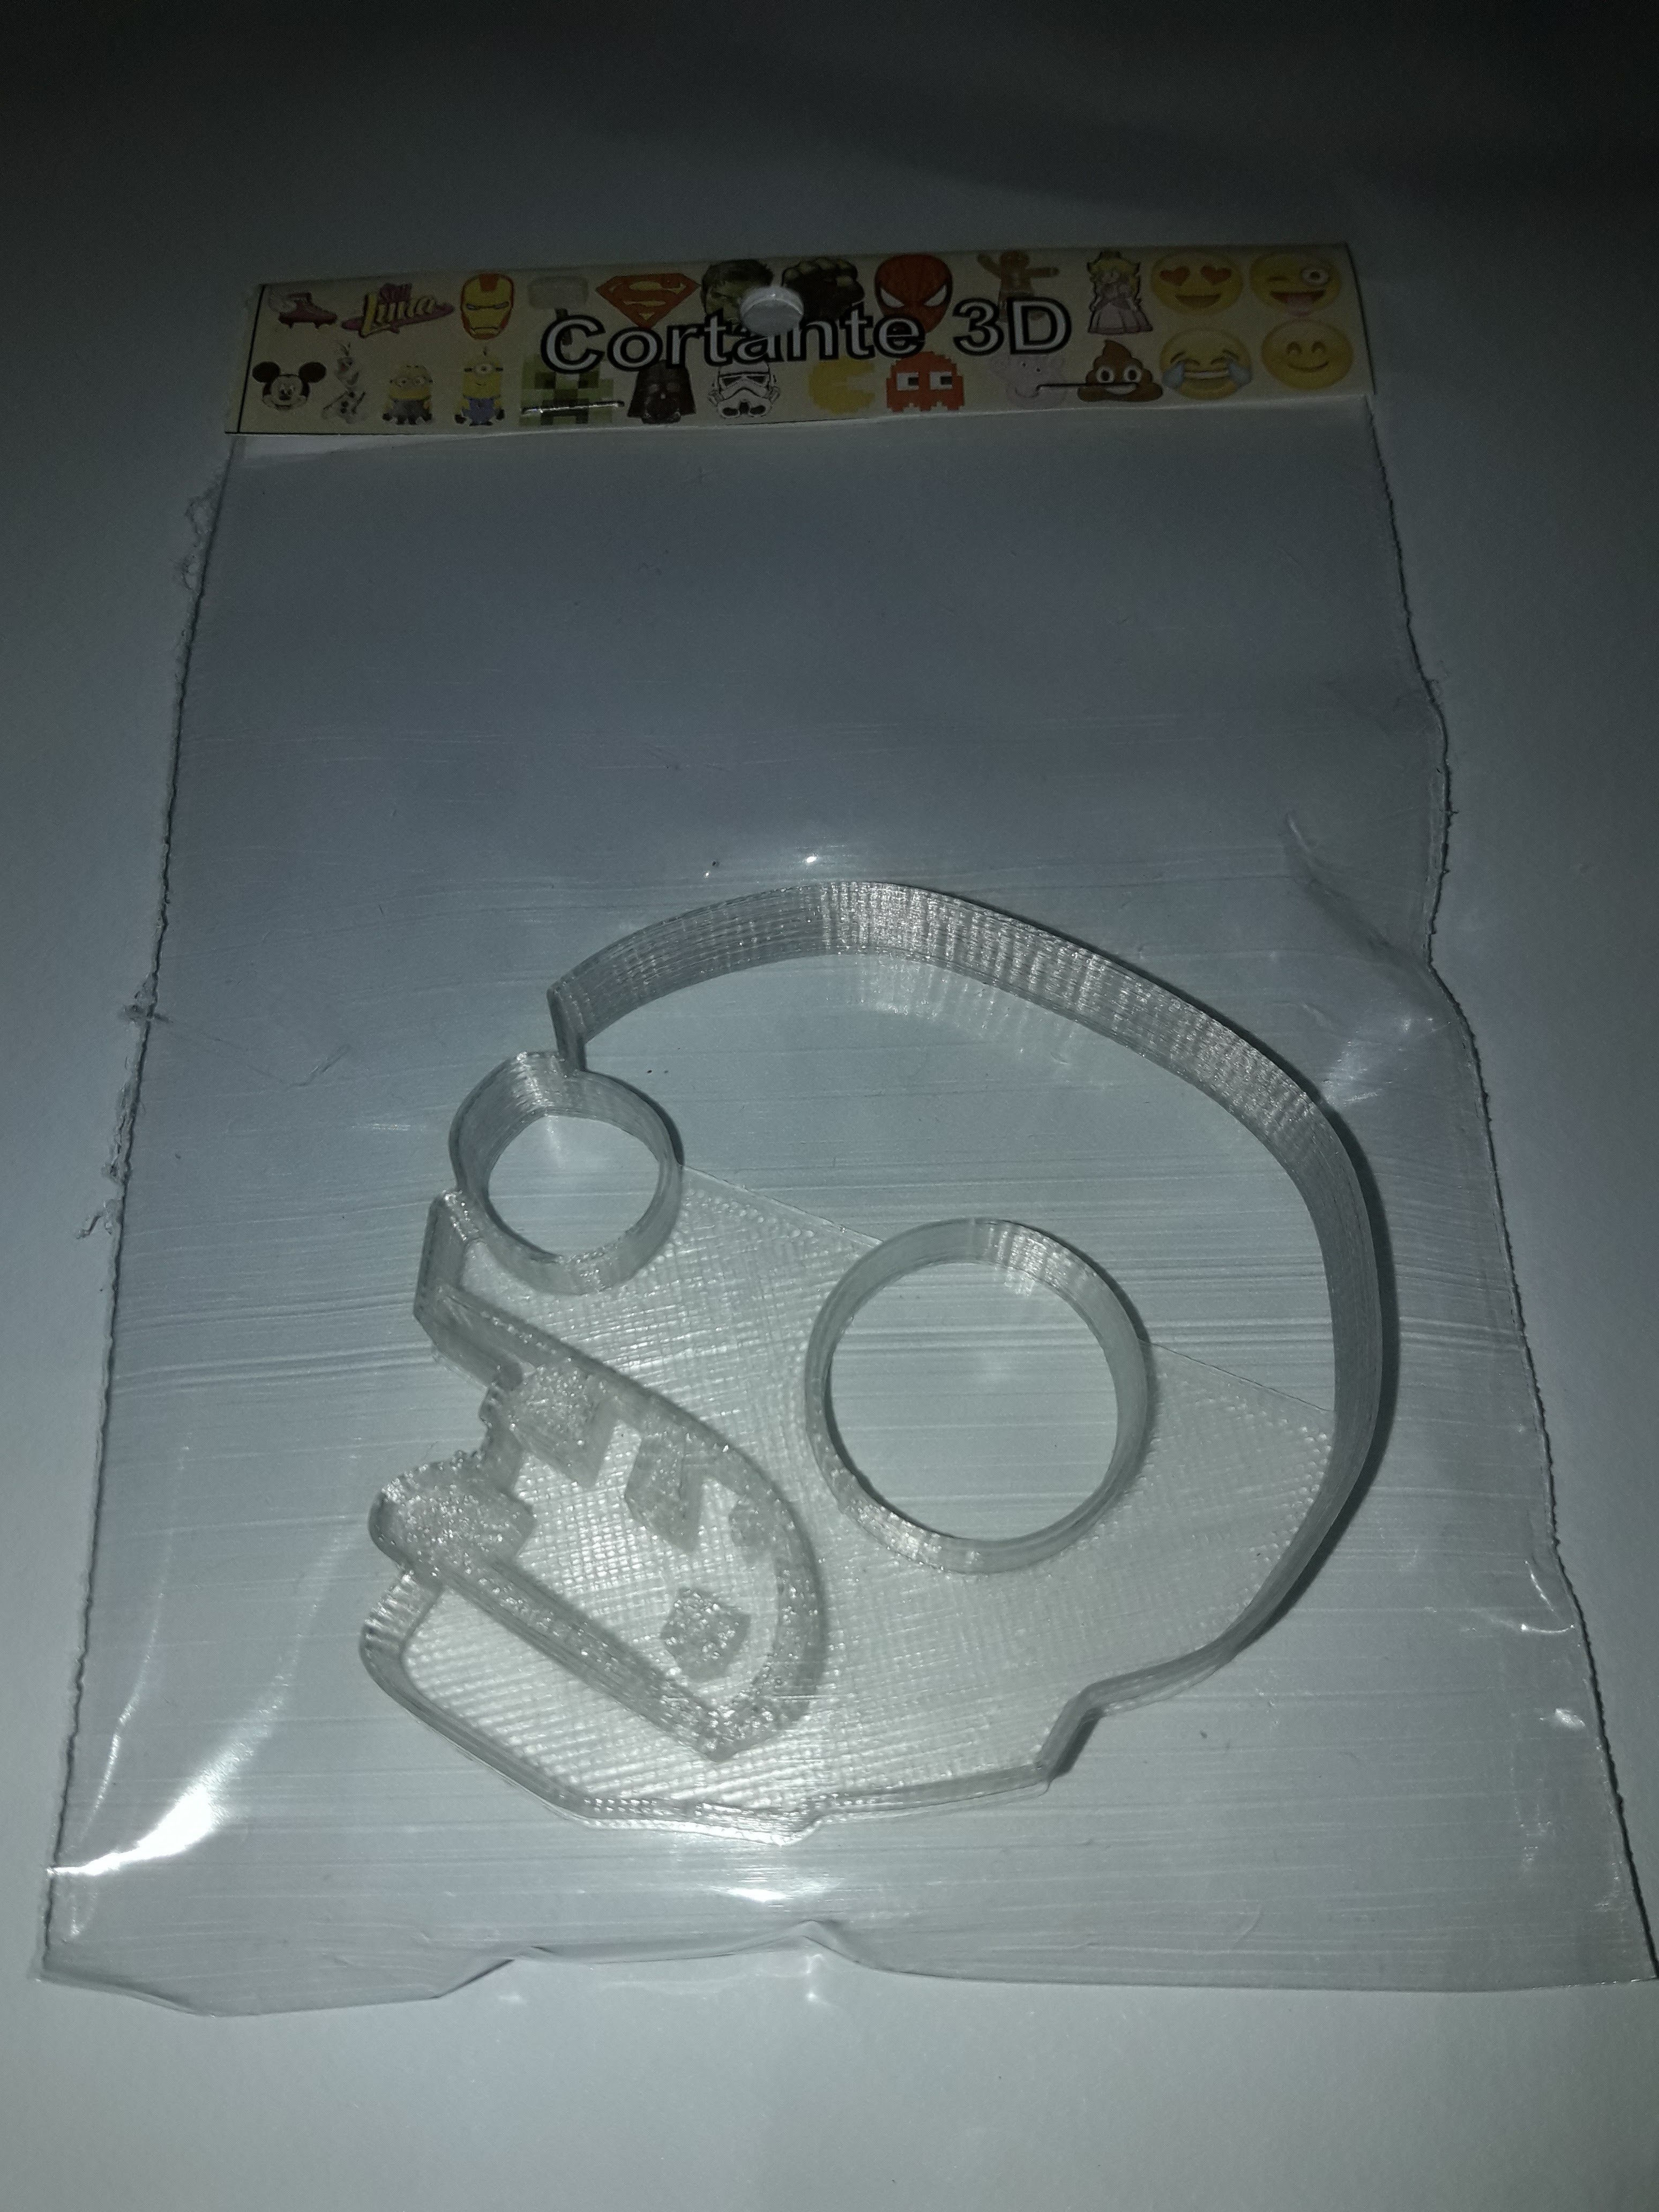 PvsZ.jpg Download STL file Plants vs Zombies cookie cutter • 3D printable template, Chapu